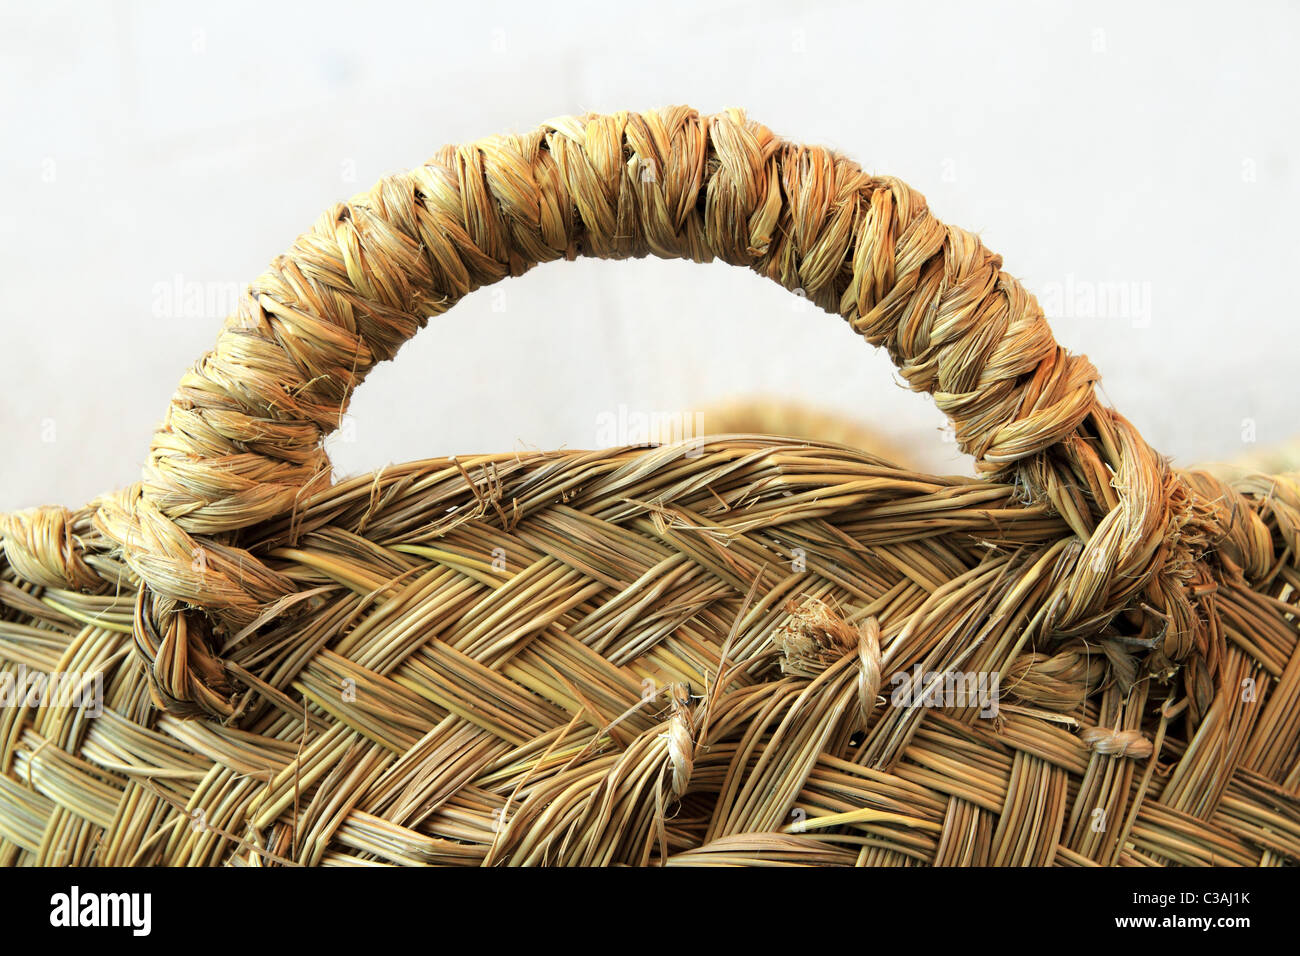 esparto grass handcraft basket handle texture traditional Spain crafts - Stock Image